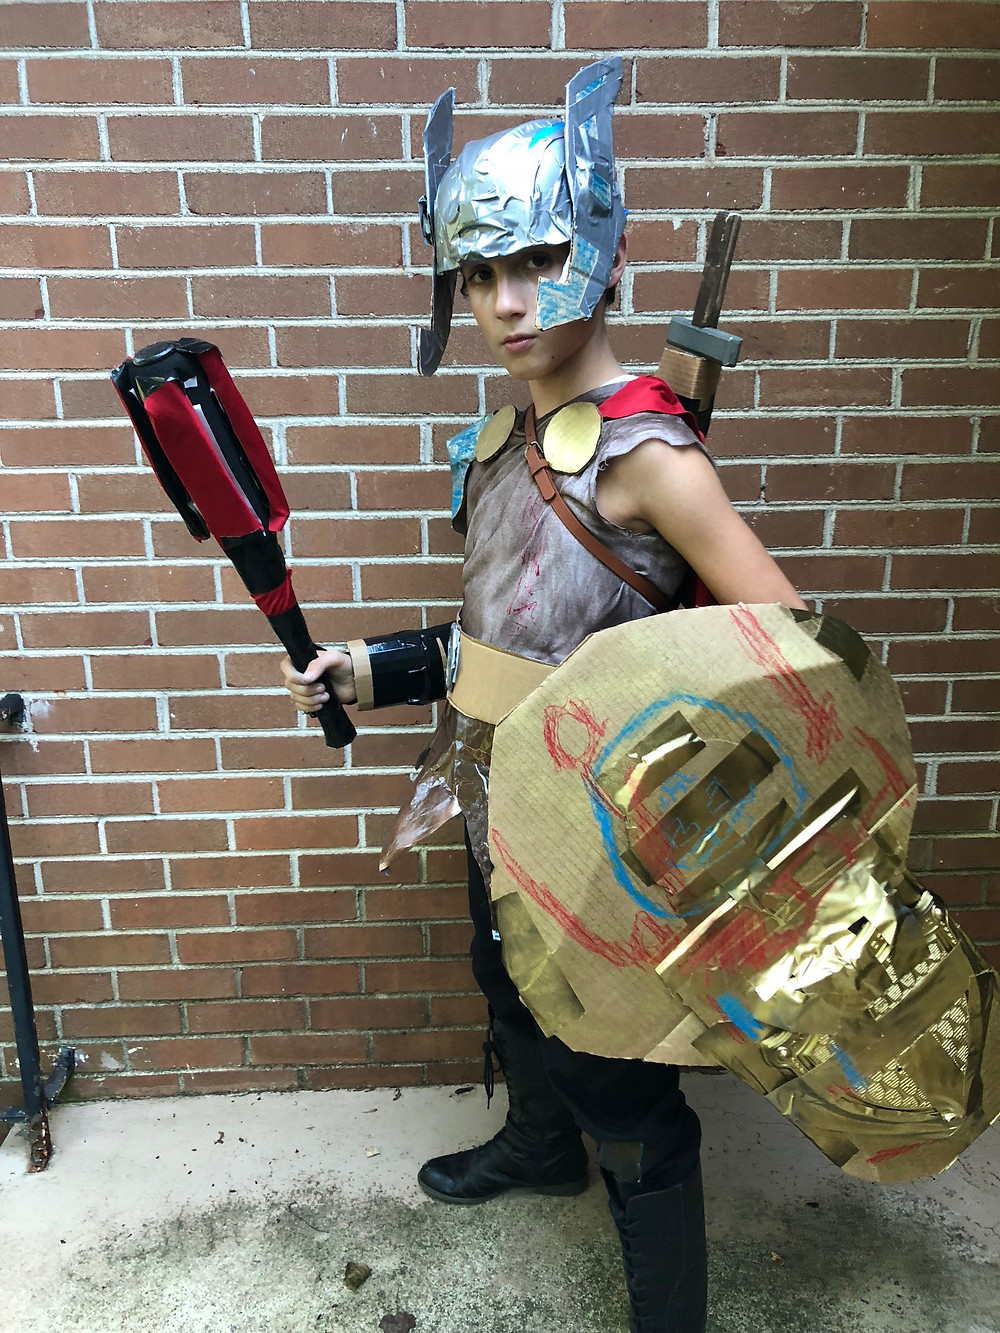 Shaw Shurley as Thor